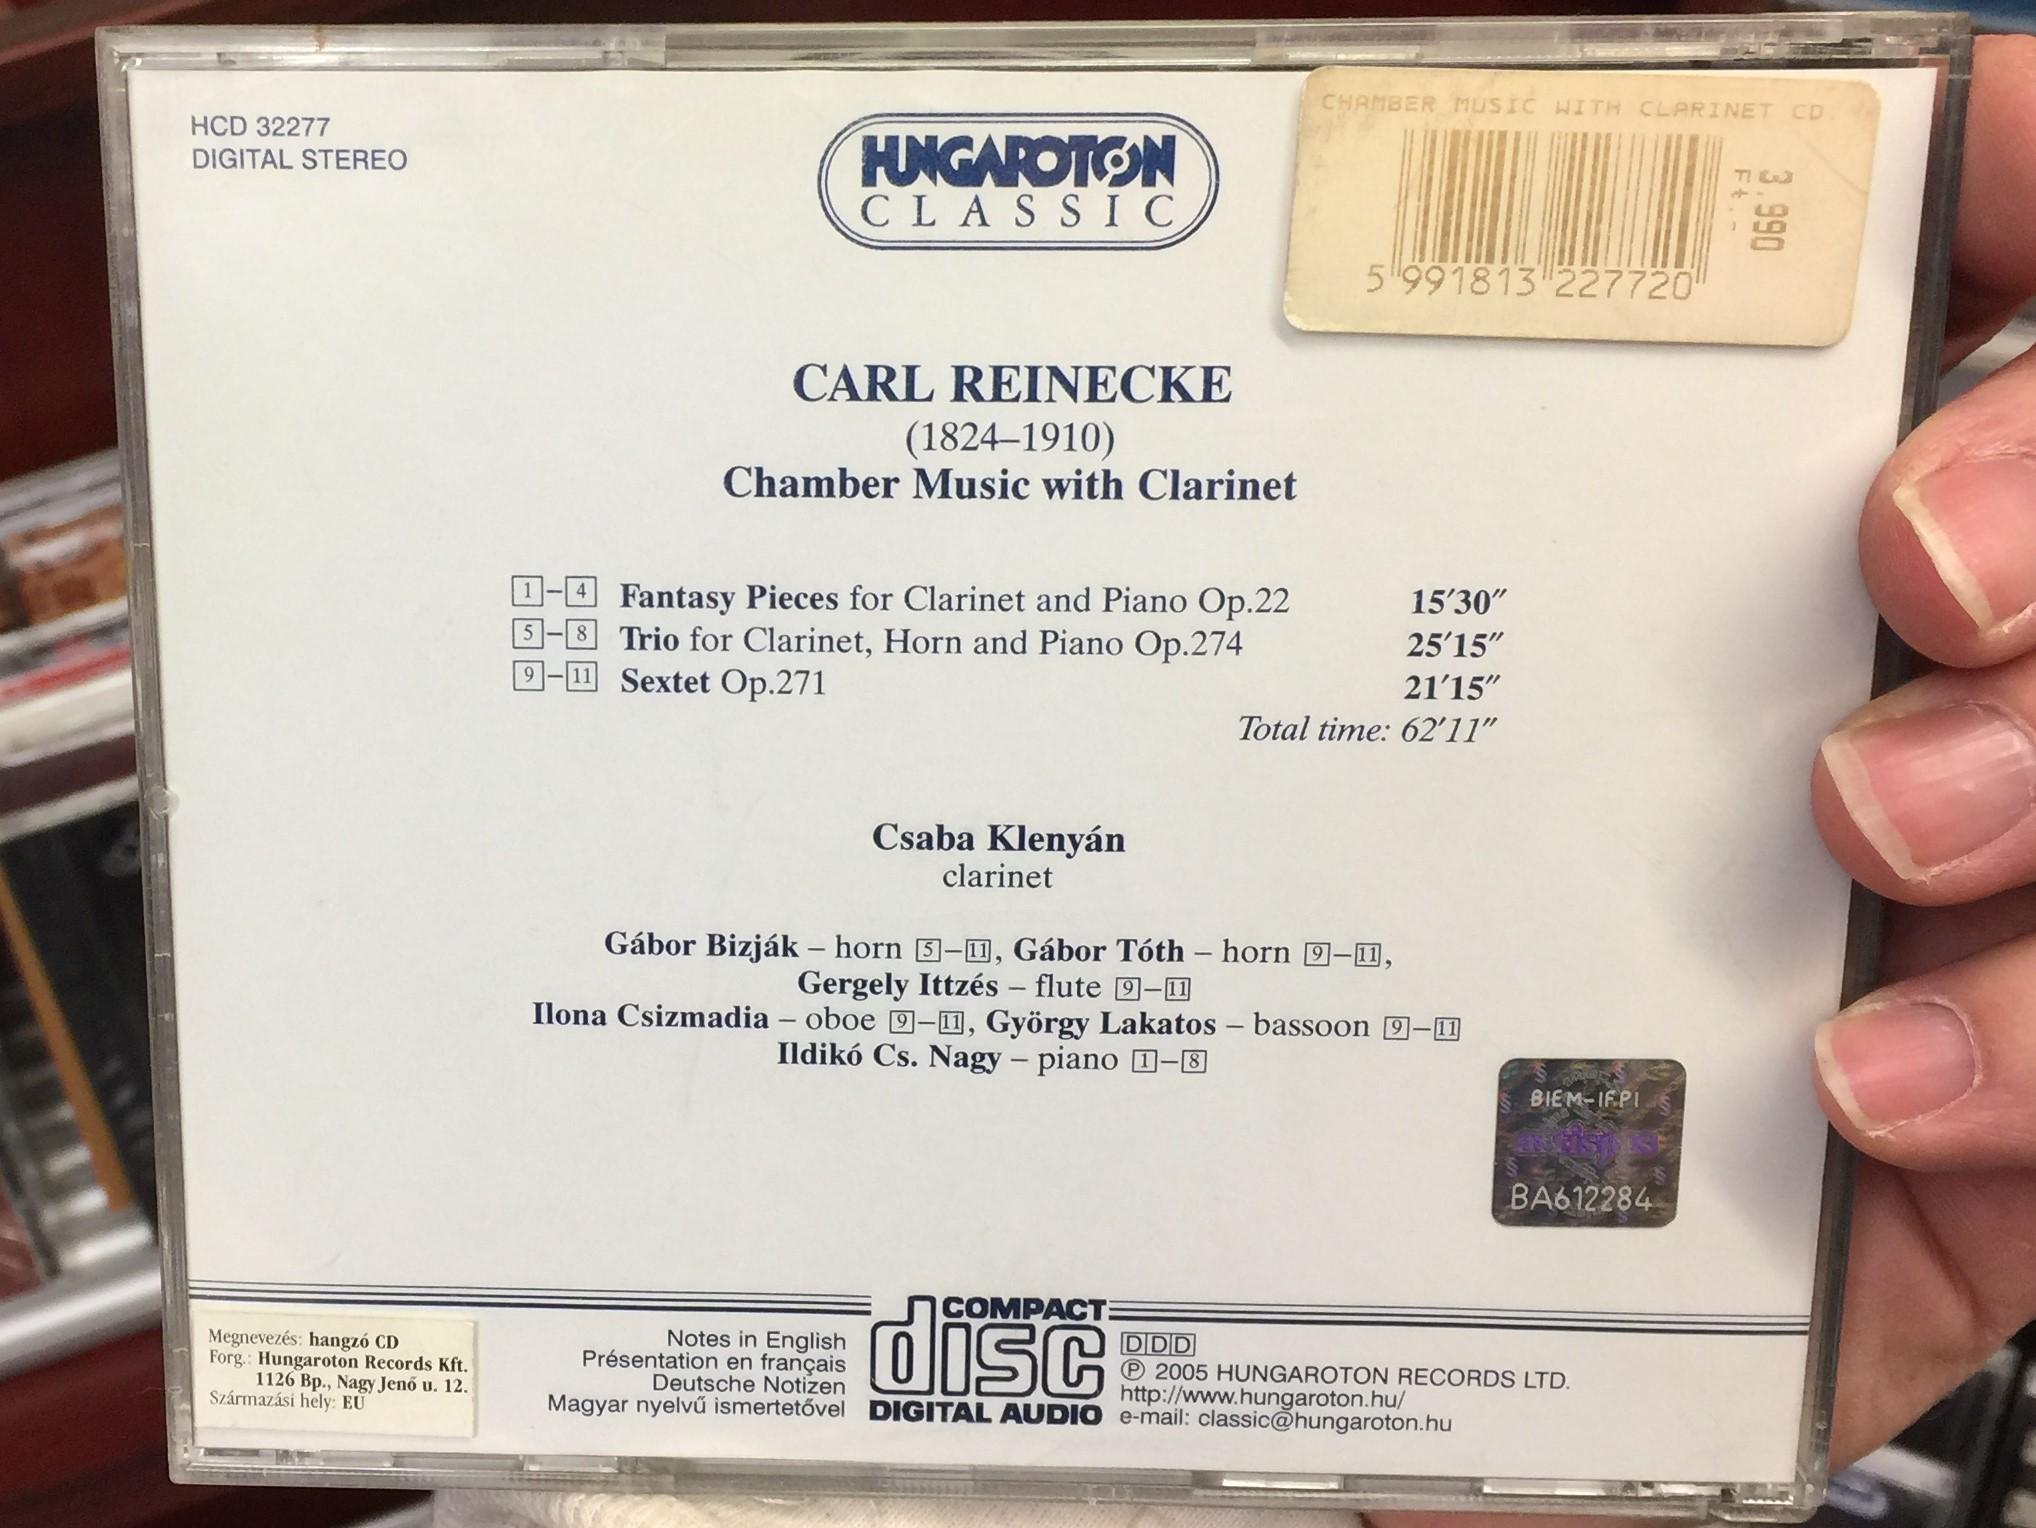 carl-reinecke-fantasy-pieces-op.-22.-trio-op.-274-sextet-op.-271-csaba-klenyan-gabor-bizjak-gabor-toth-gergely-ittzes-ilona-csizmadia-gyorgy-lakatos-hungaroton-classic-audio-cd-2005-ste.jpg